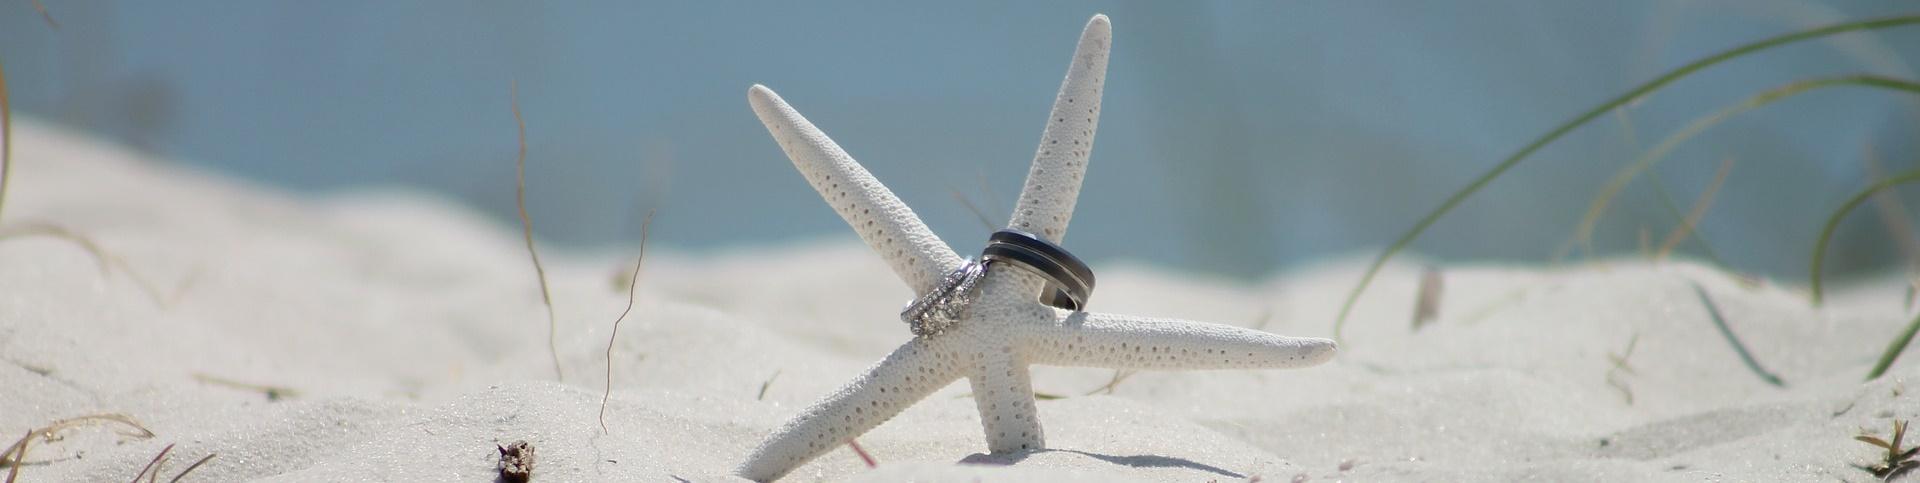 Trouwen en bruiloft op Ibiza